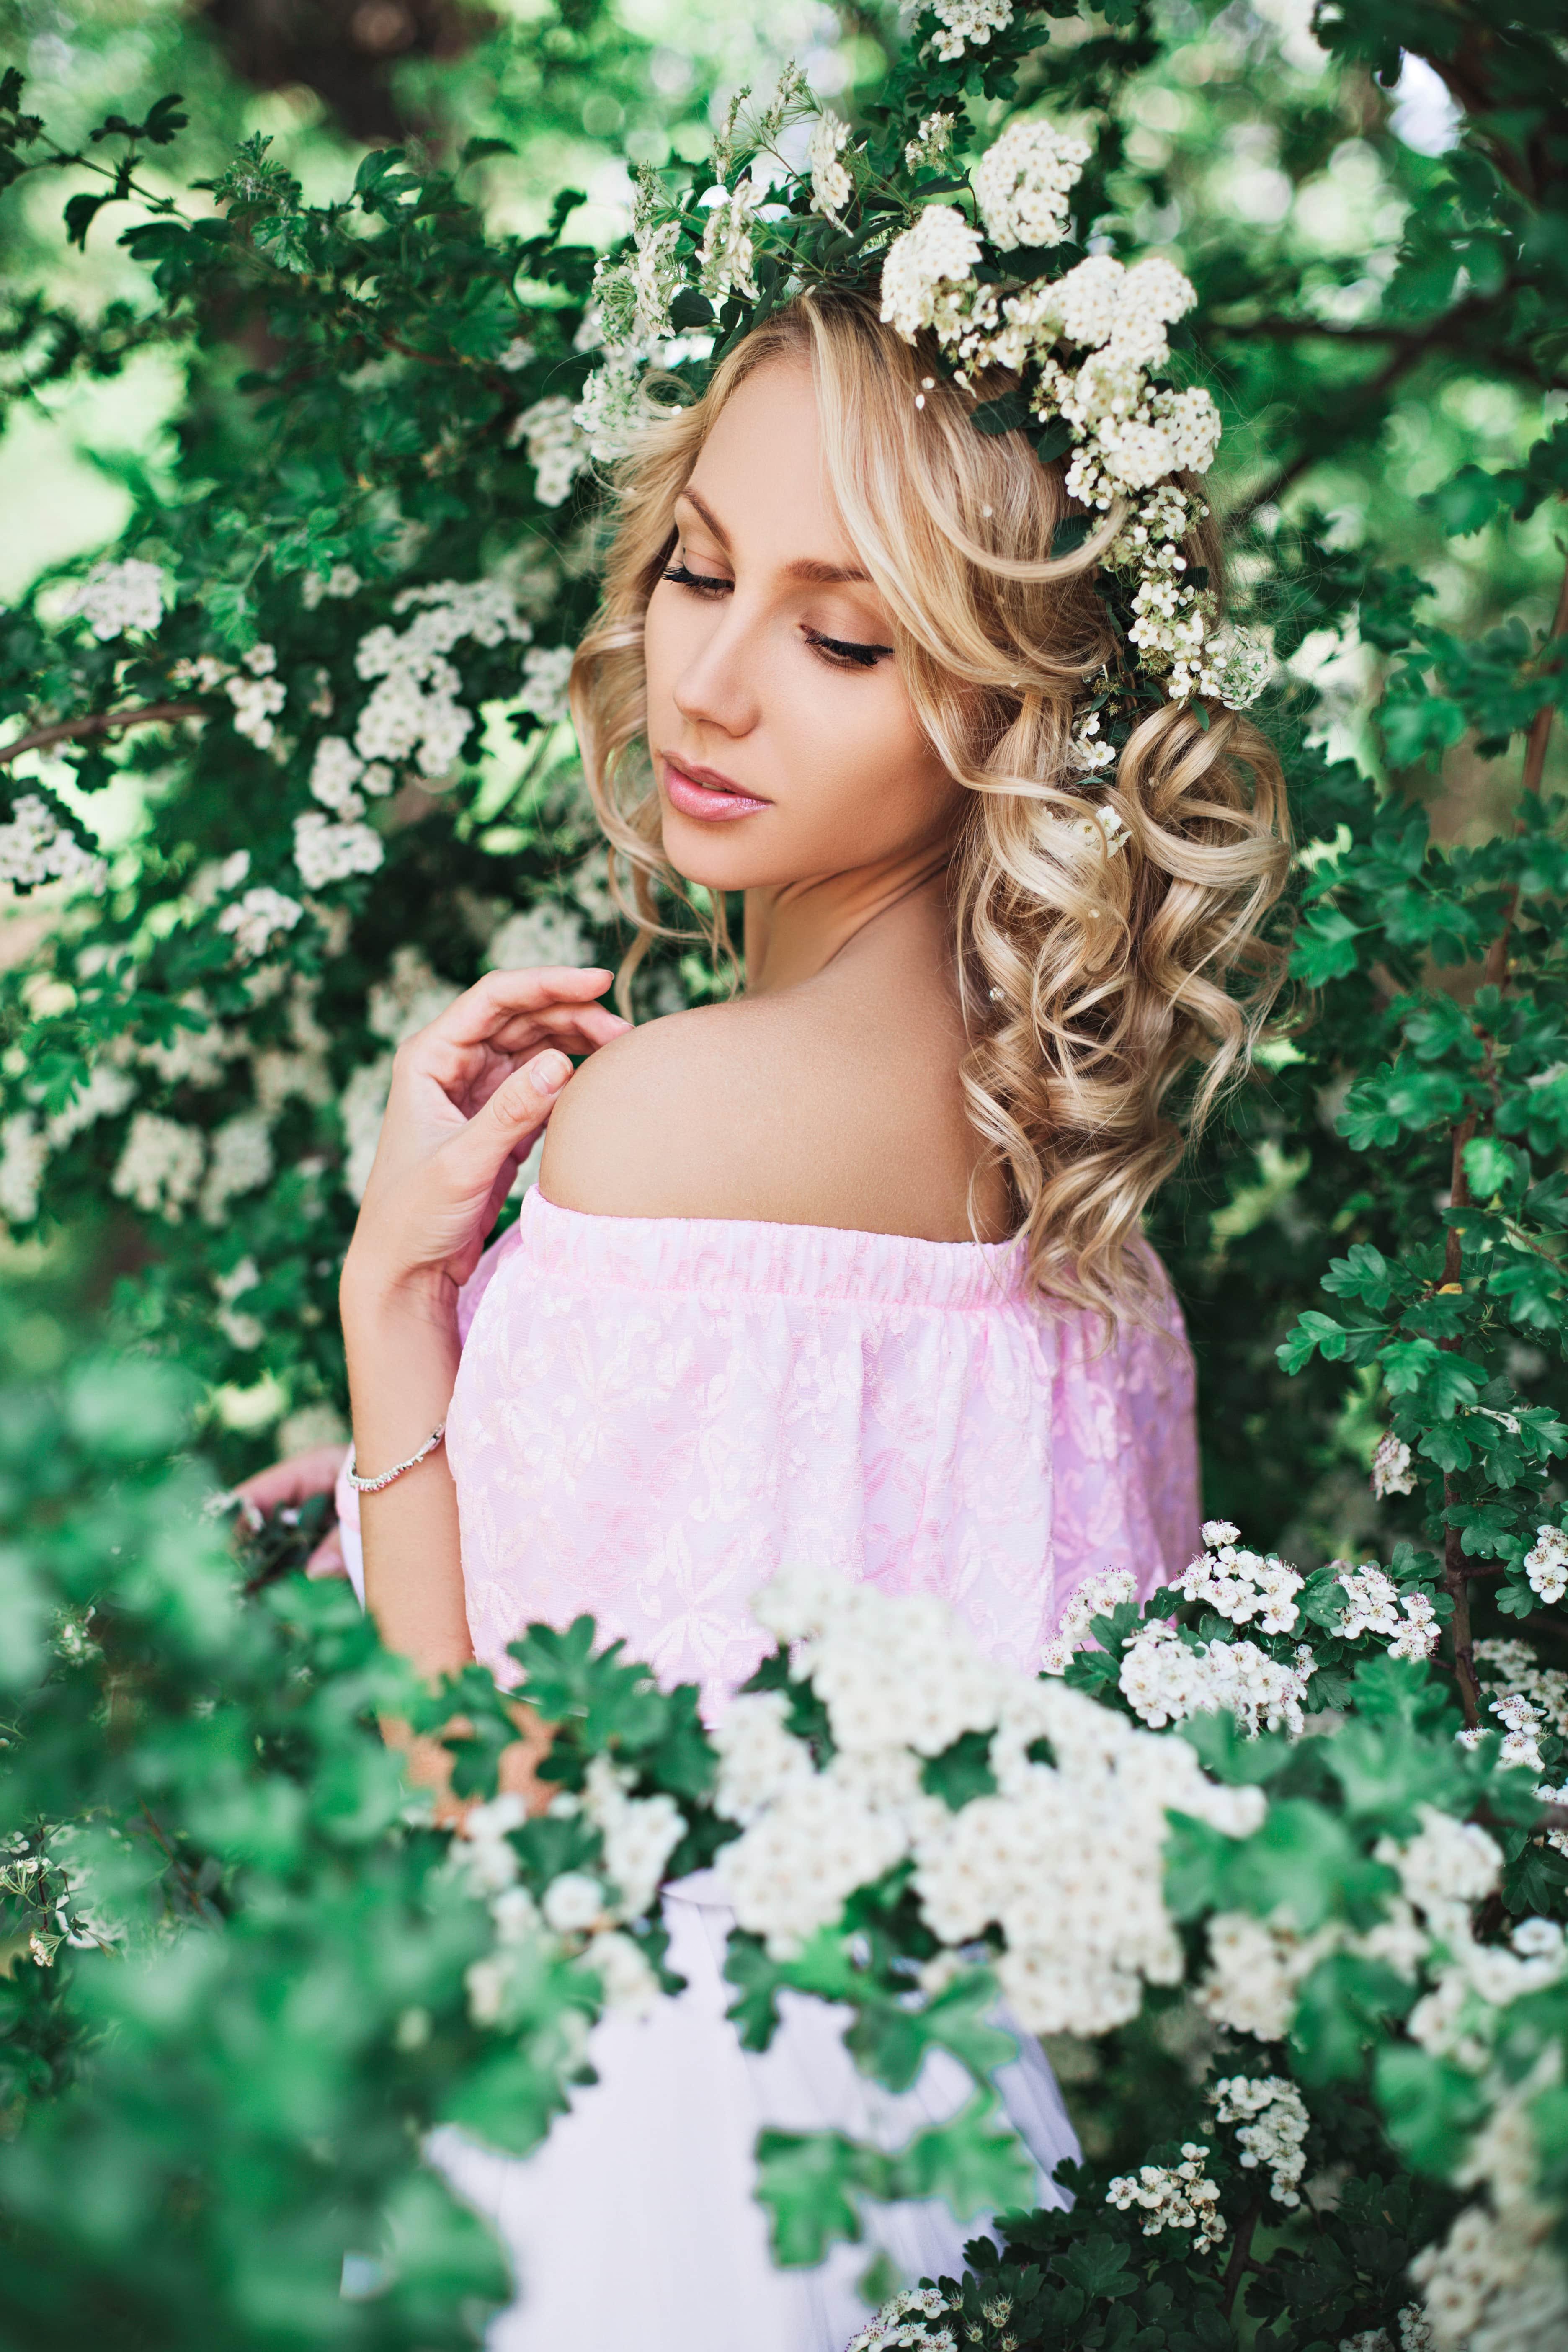 modern perm styles blonde curls floral crown